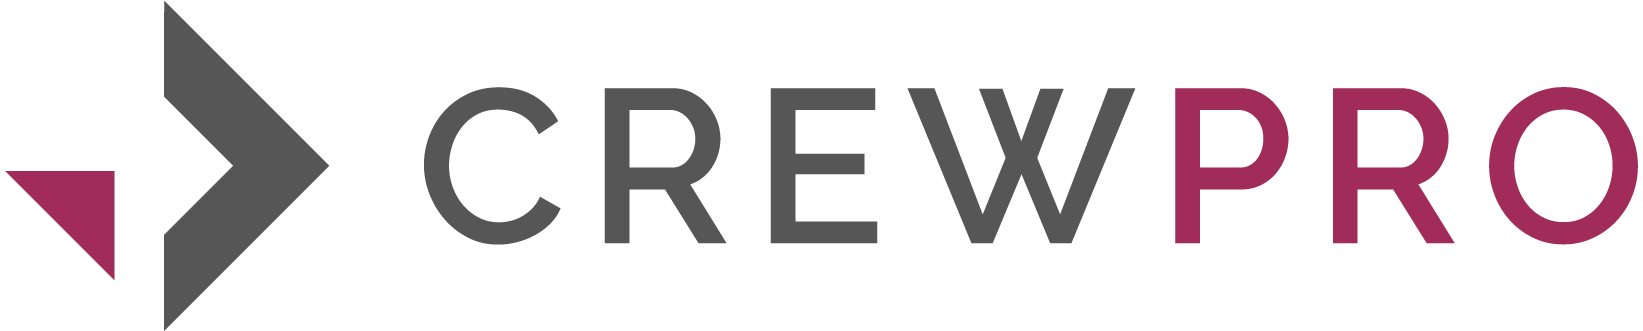 Crewpro compleet